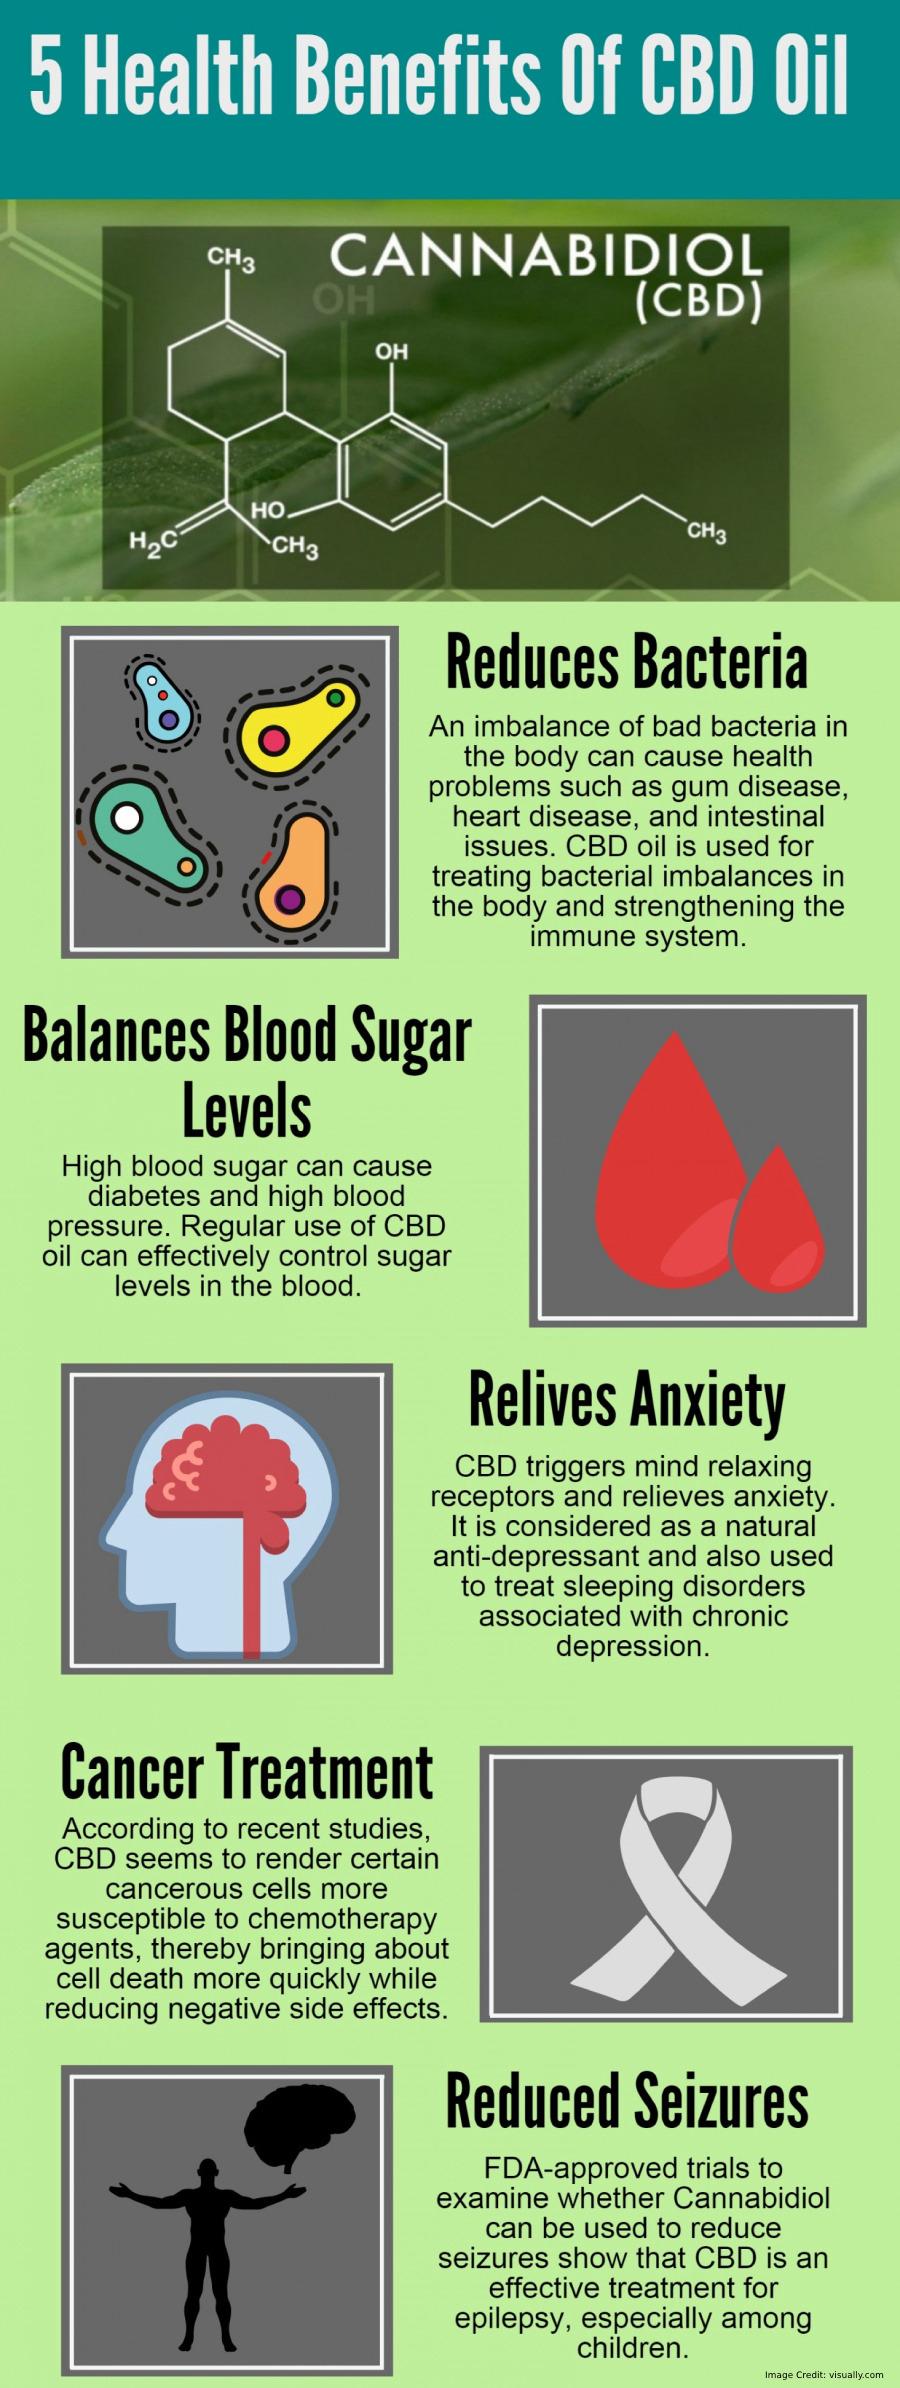 Cancer Cures Part 4 - Grape Seeds